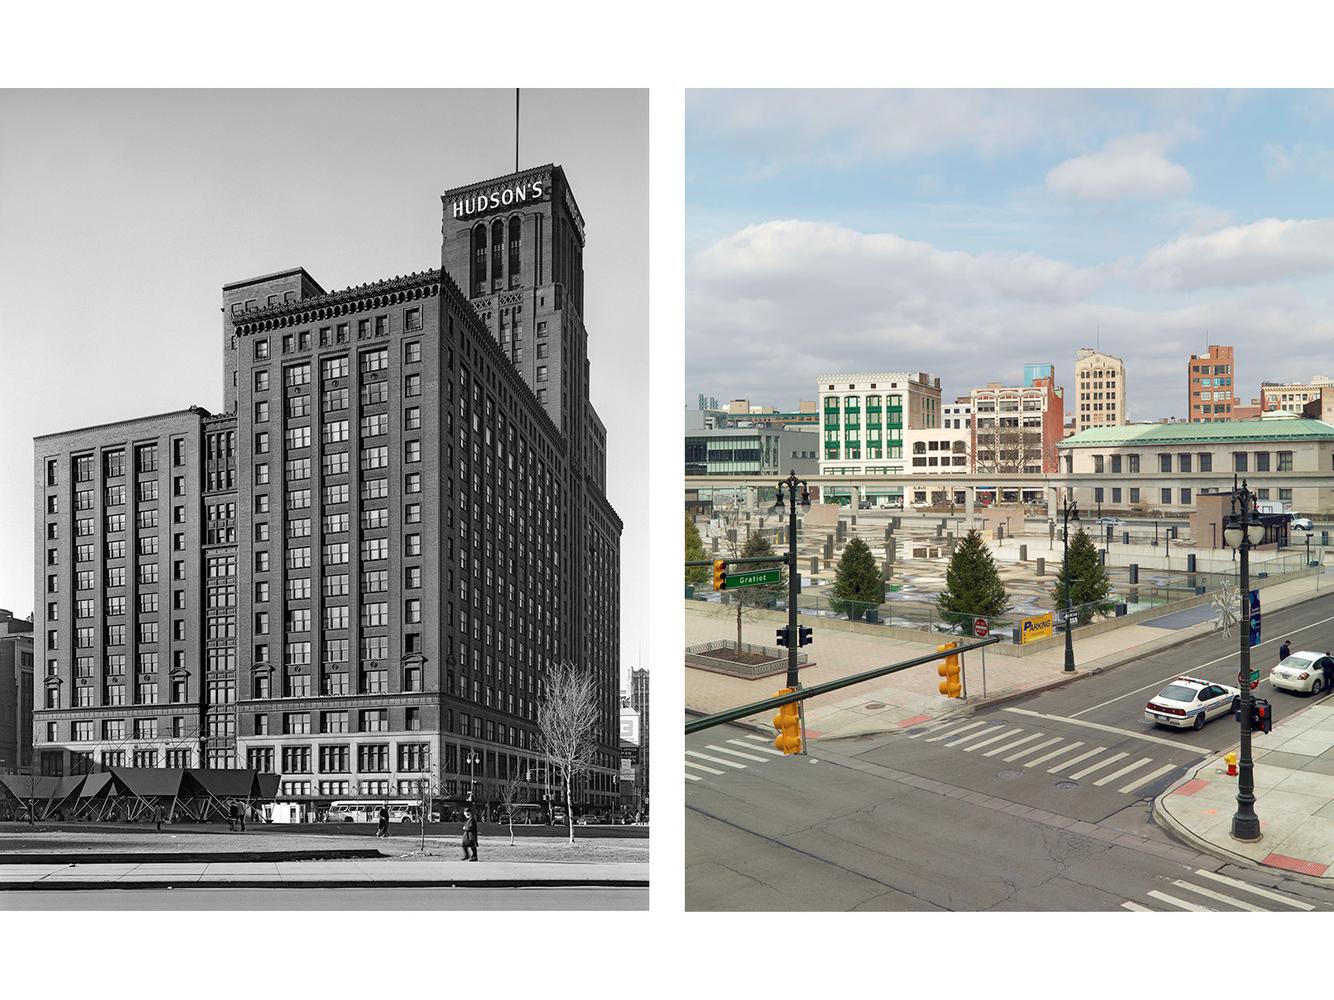 1206 Woodward Avenue, Detroit 1973-2010